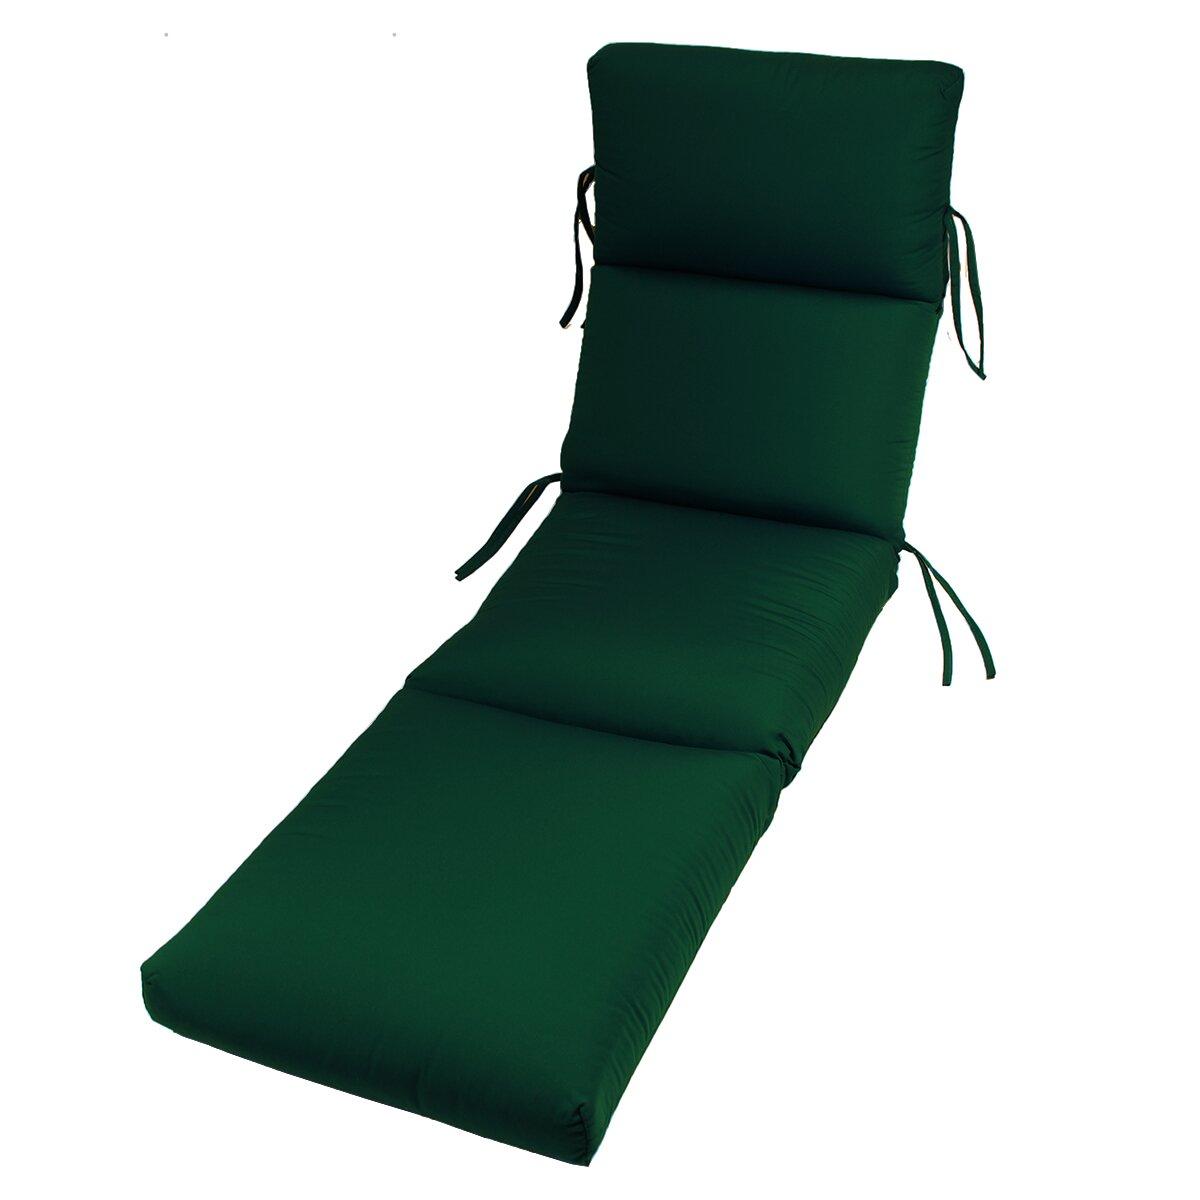 Comfort clas outdoor sunbrella chaise lounge cushion for Chaise cushions sunbrella